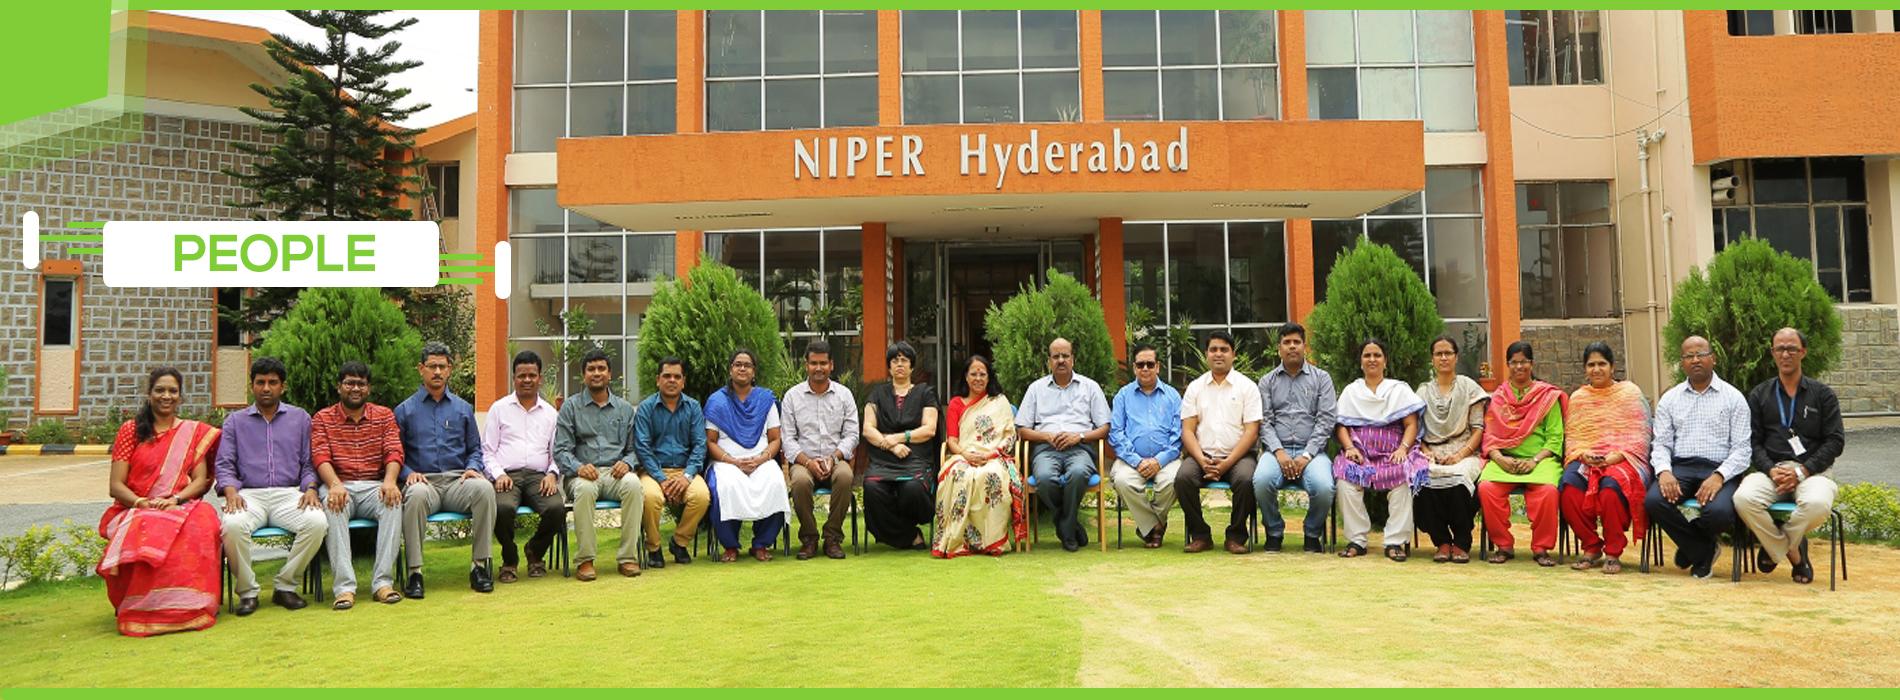 People- NIPER, Hyderabad